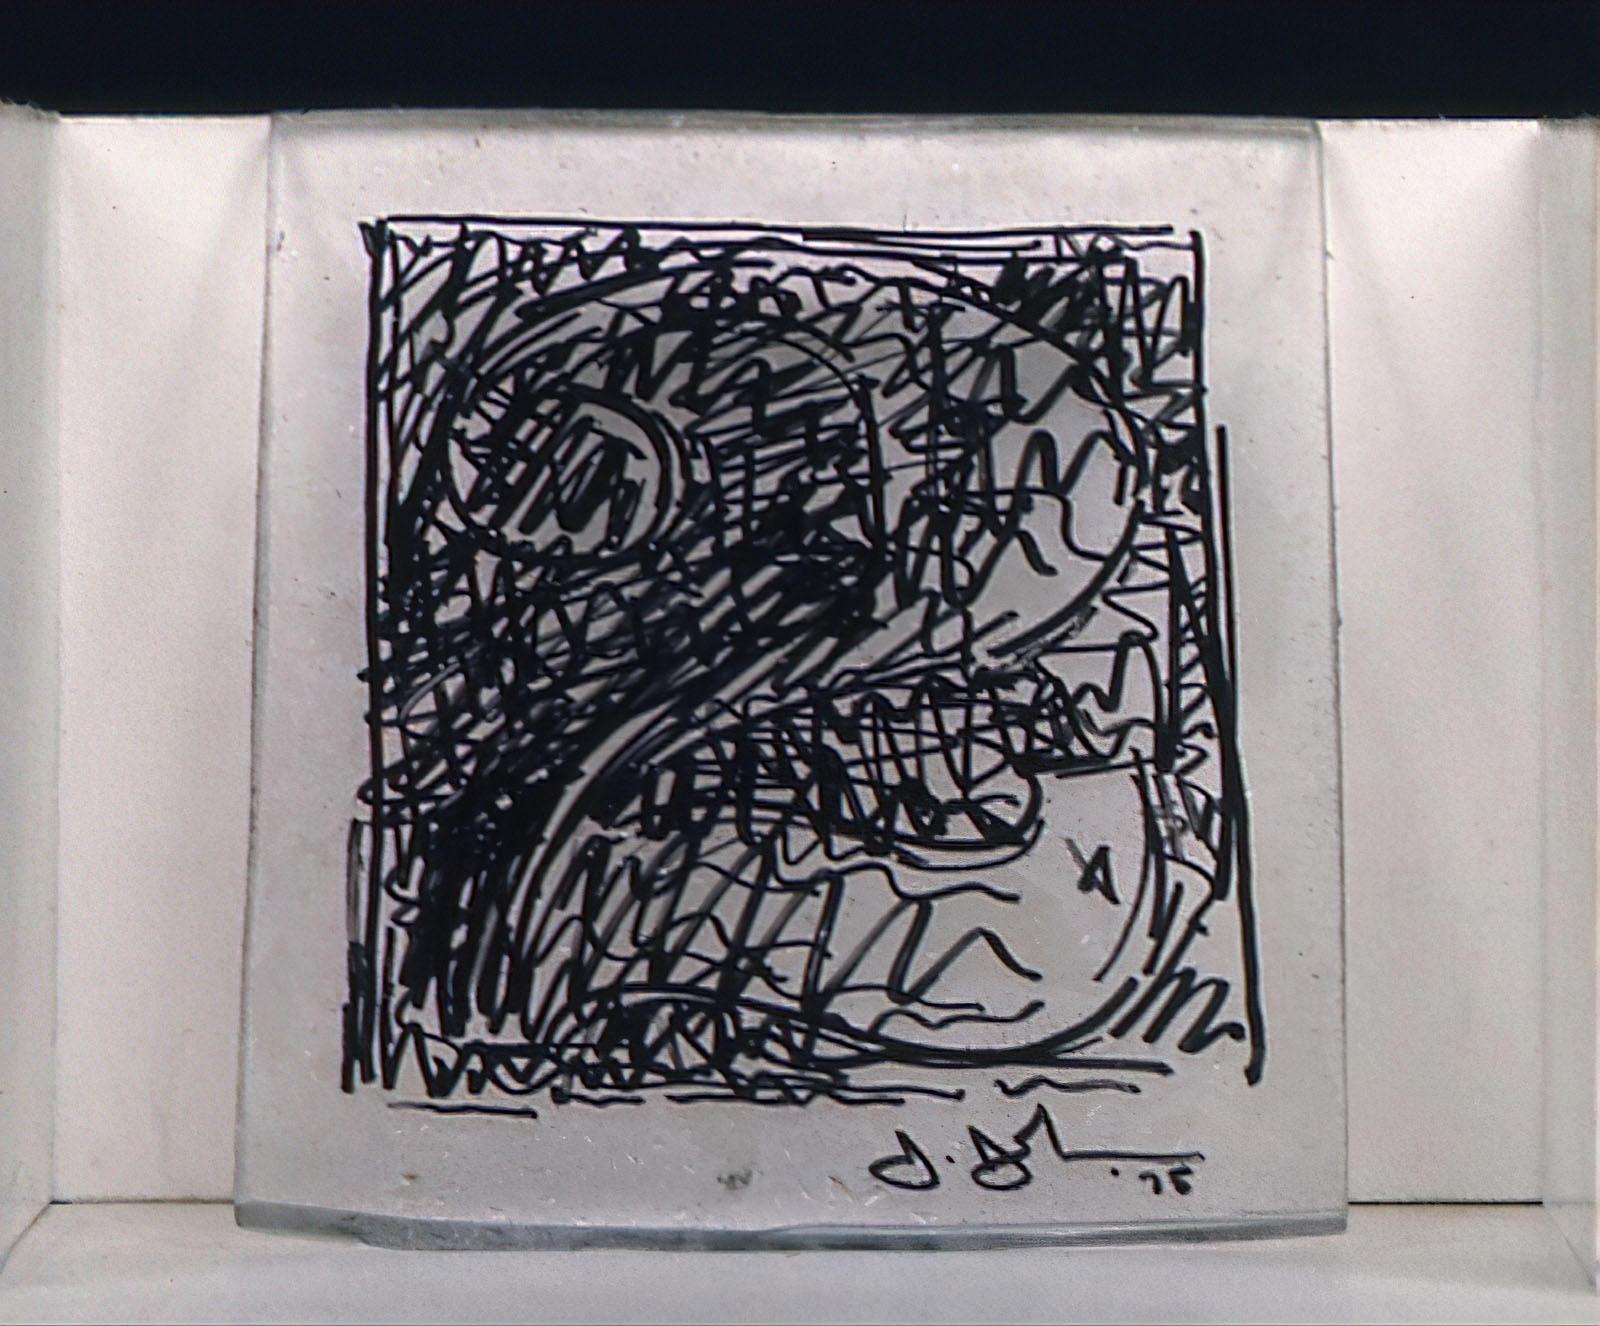 Jasper Johns - Figure 2